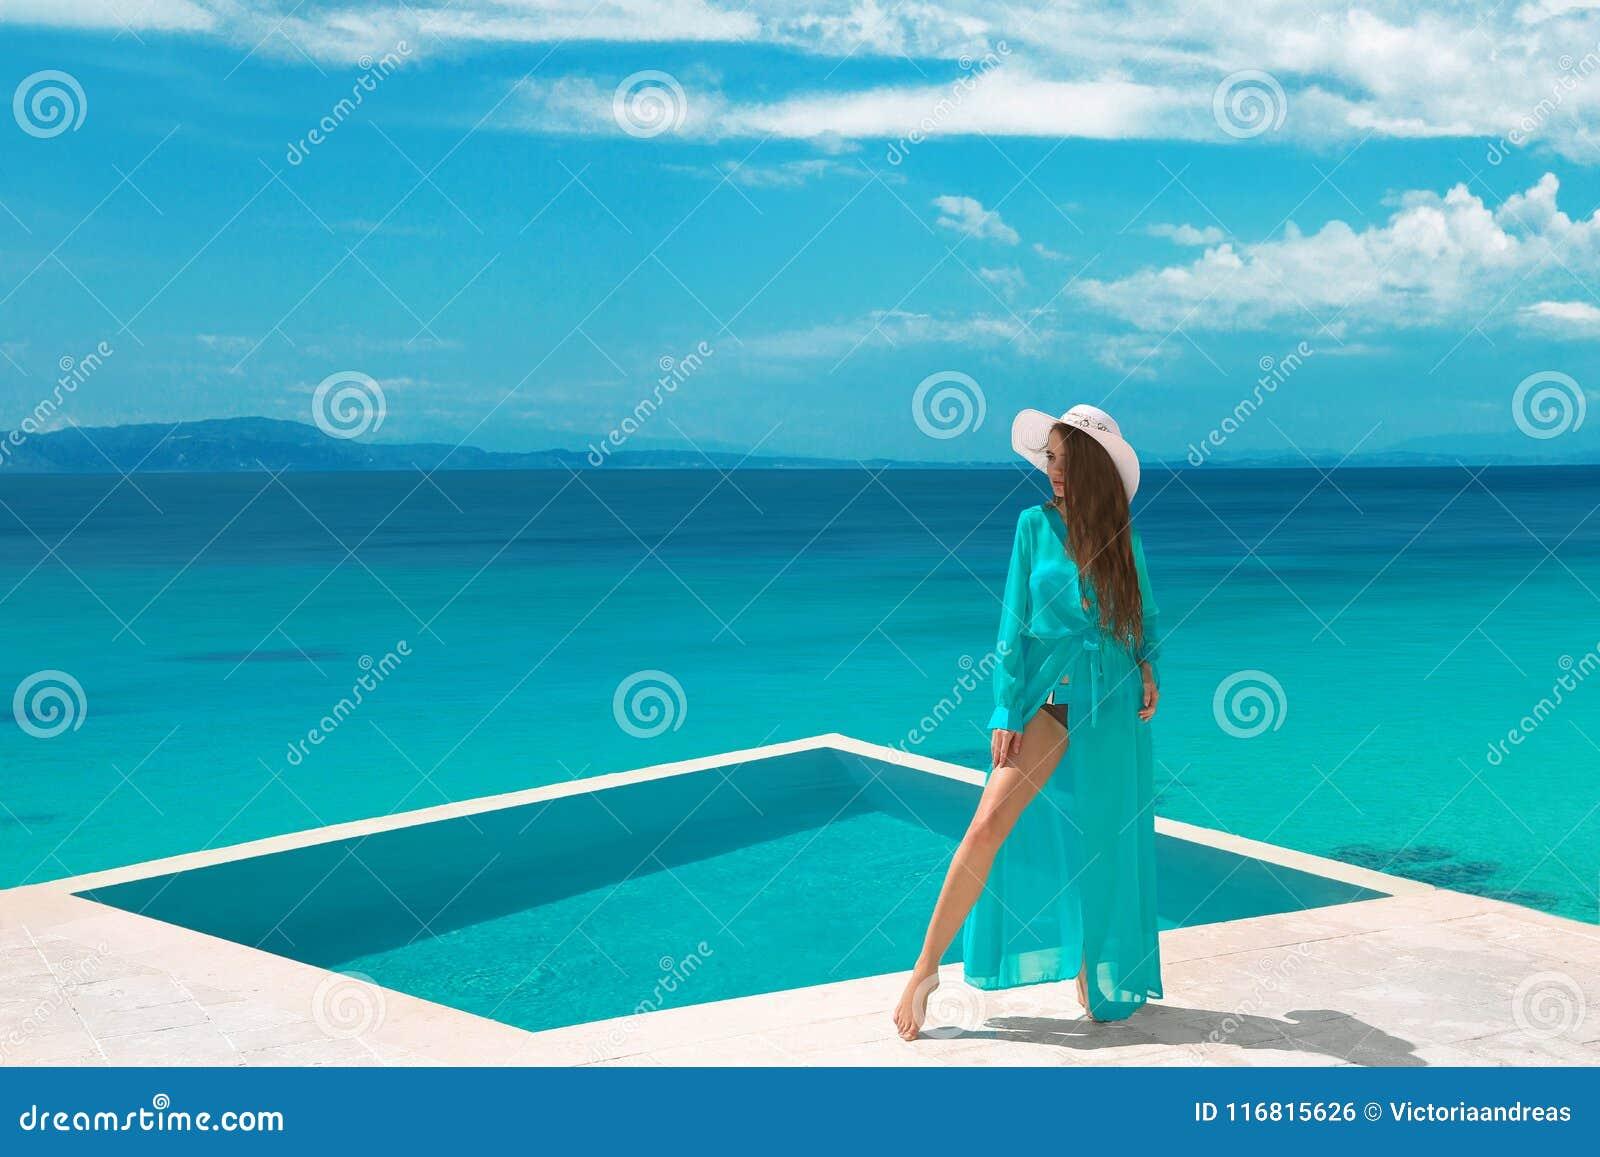 d9efdc0b81 Bikini carefree woman in swimwear enjoying honeymoon, girl relaxing by  infinity swimming pool at luxurious villa resort. Summer holiday idyllic  top view.